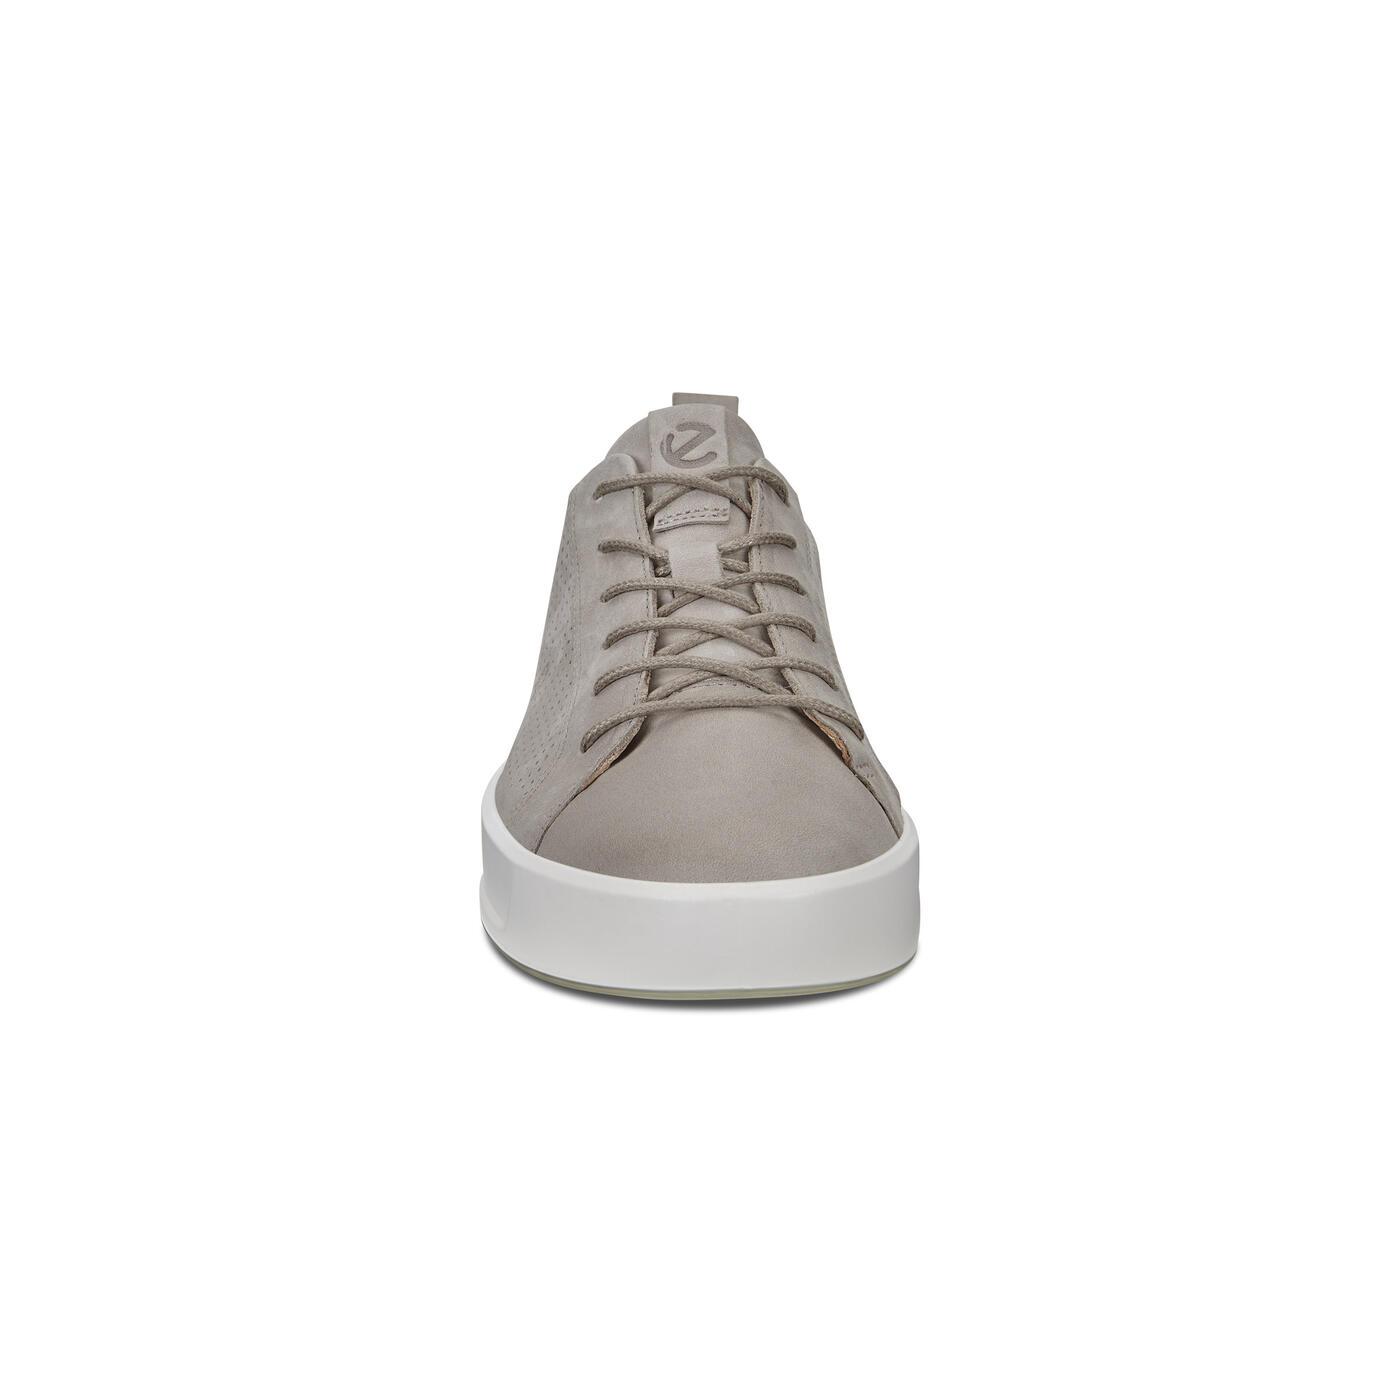 ECCO SOFT 8 M Shoe